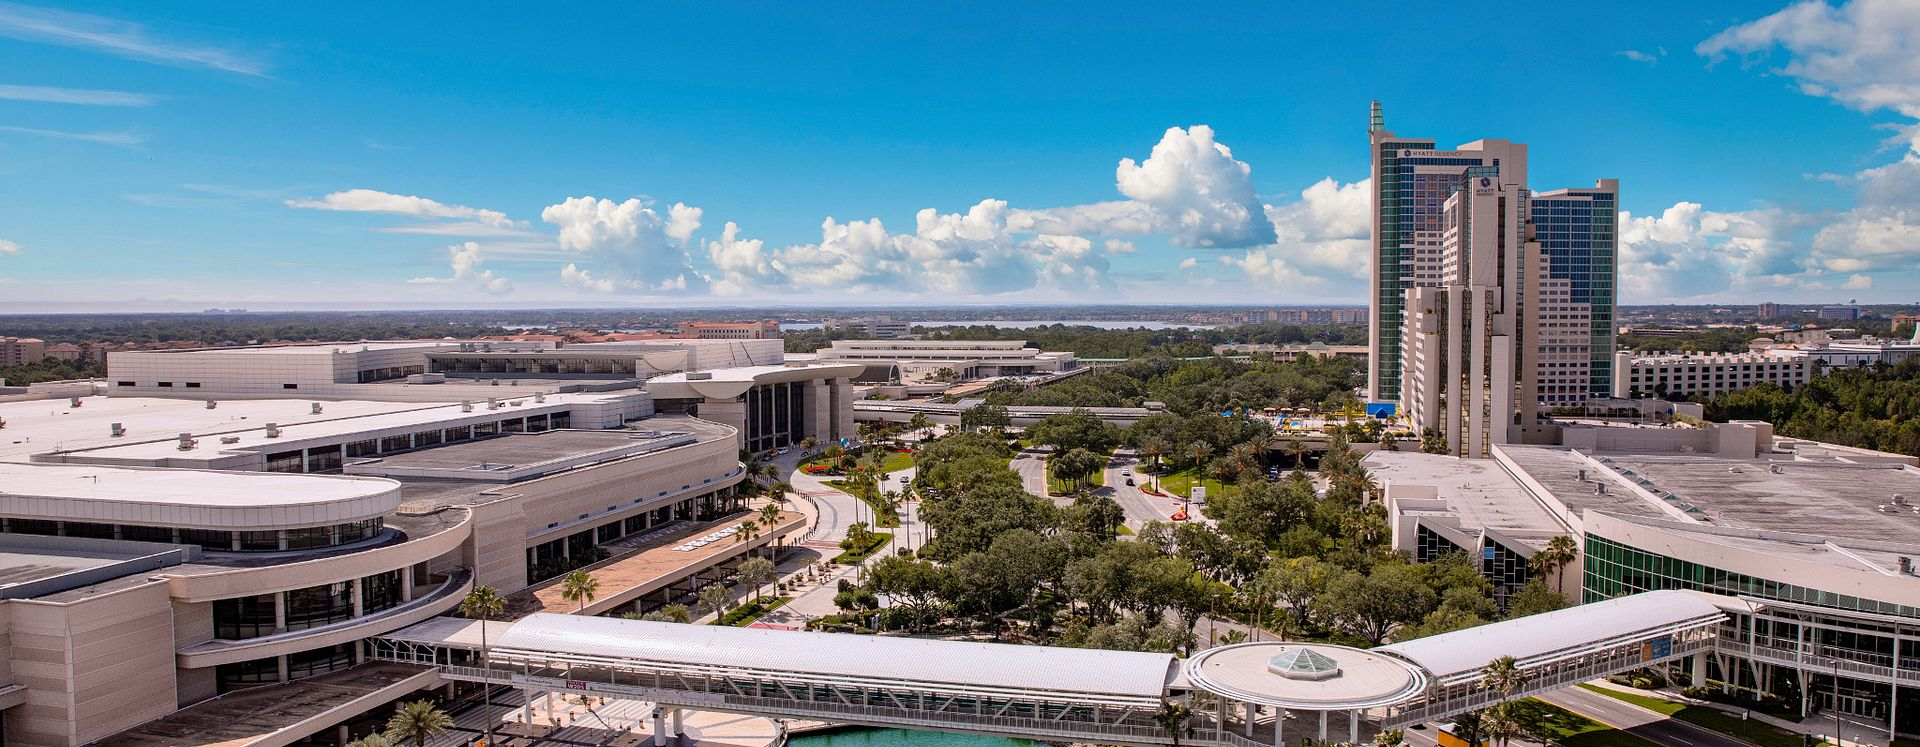 Orange County Convention Center aerial shot with connectivity bridge